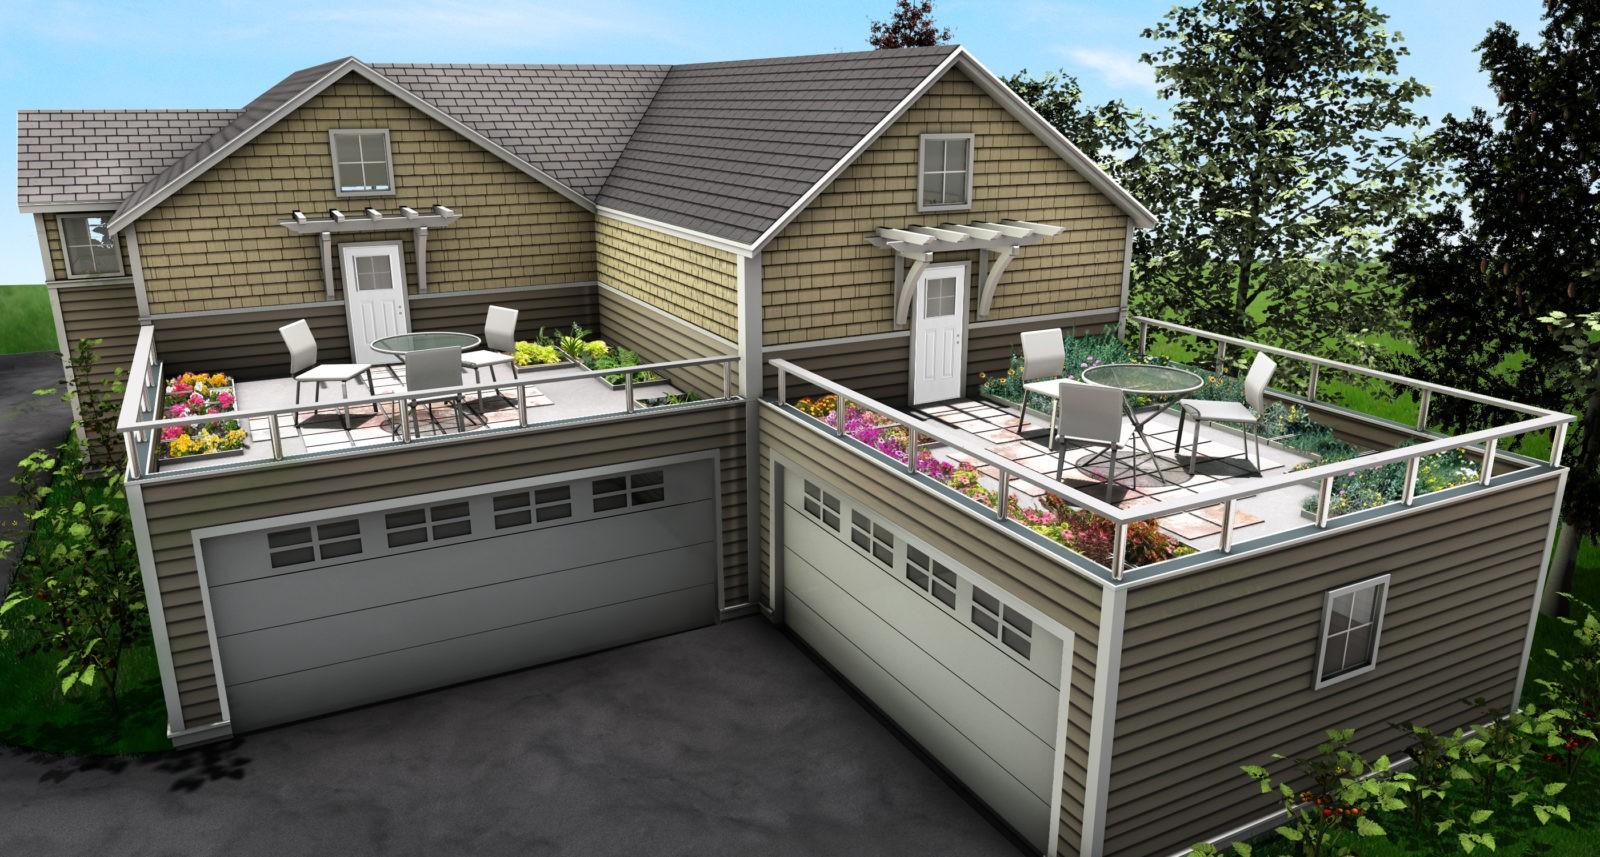 Smart Haus smarthaus duplex coming soon libertyville il smart haus